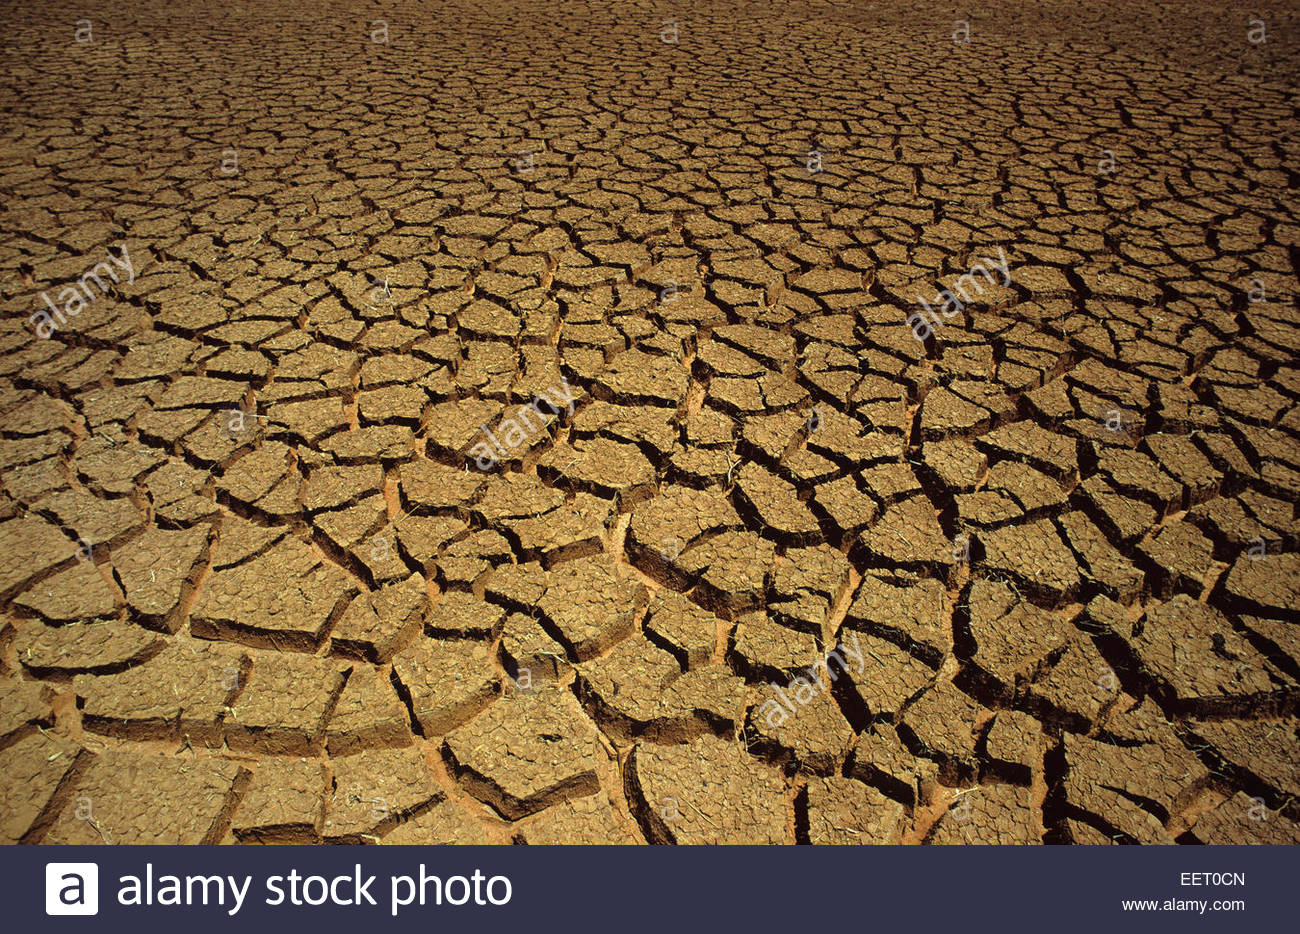 Desertification, Namibia. - Stock Image